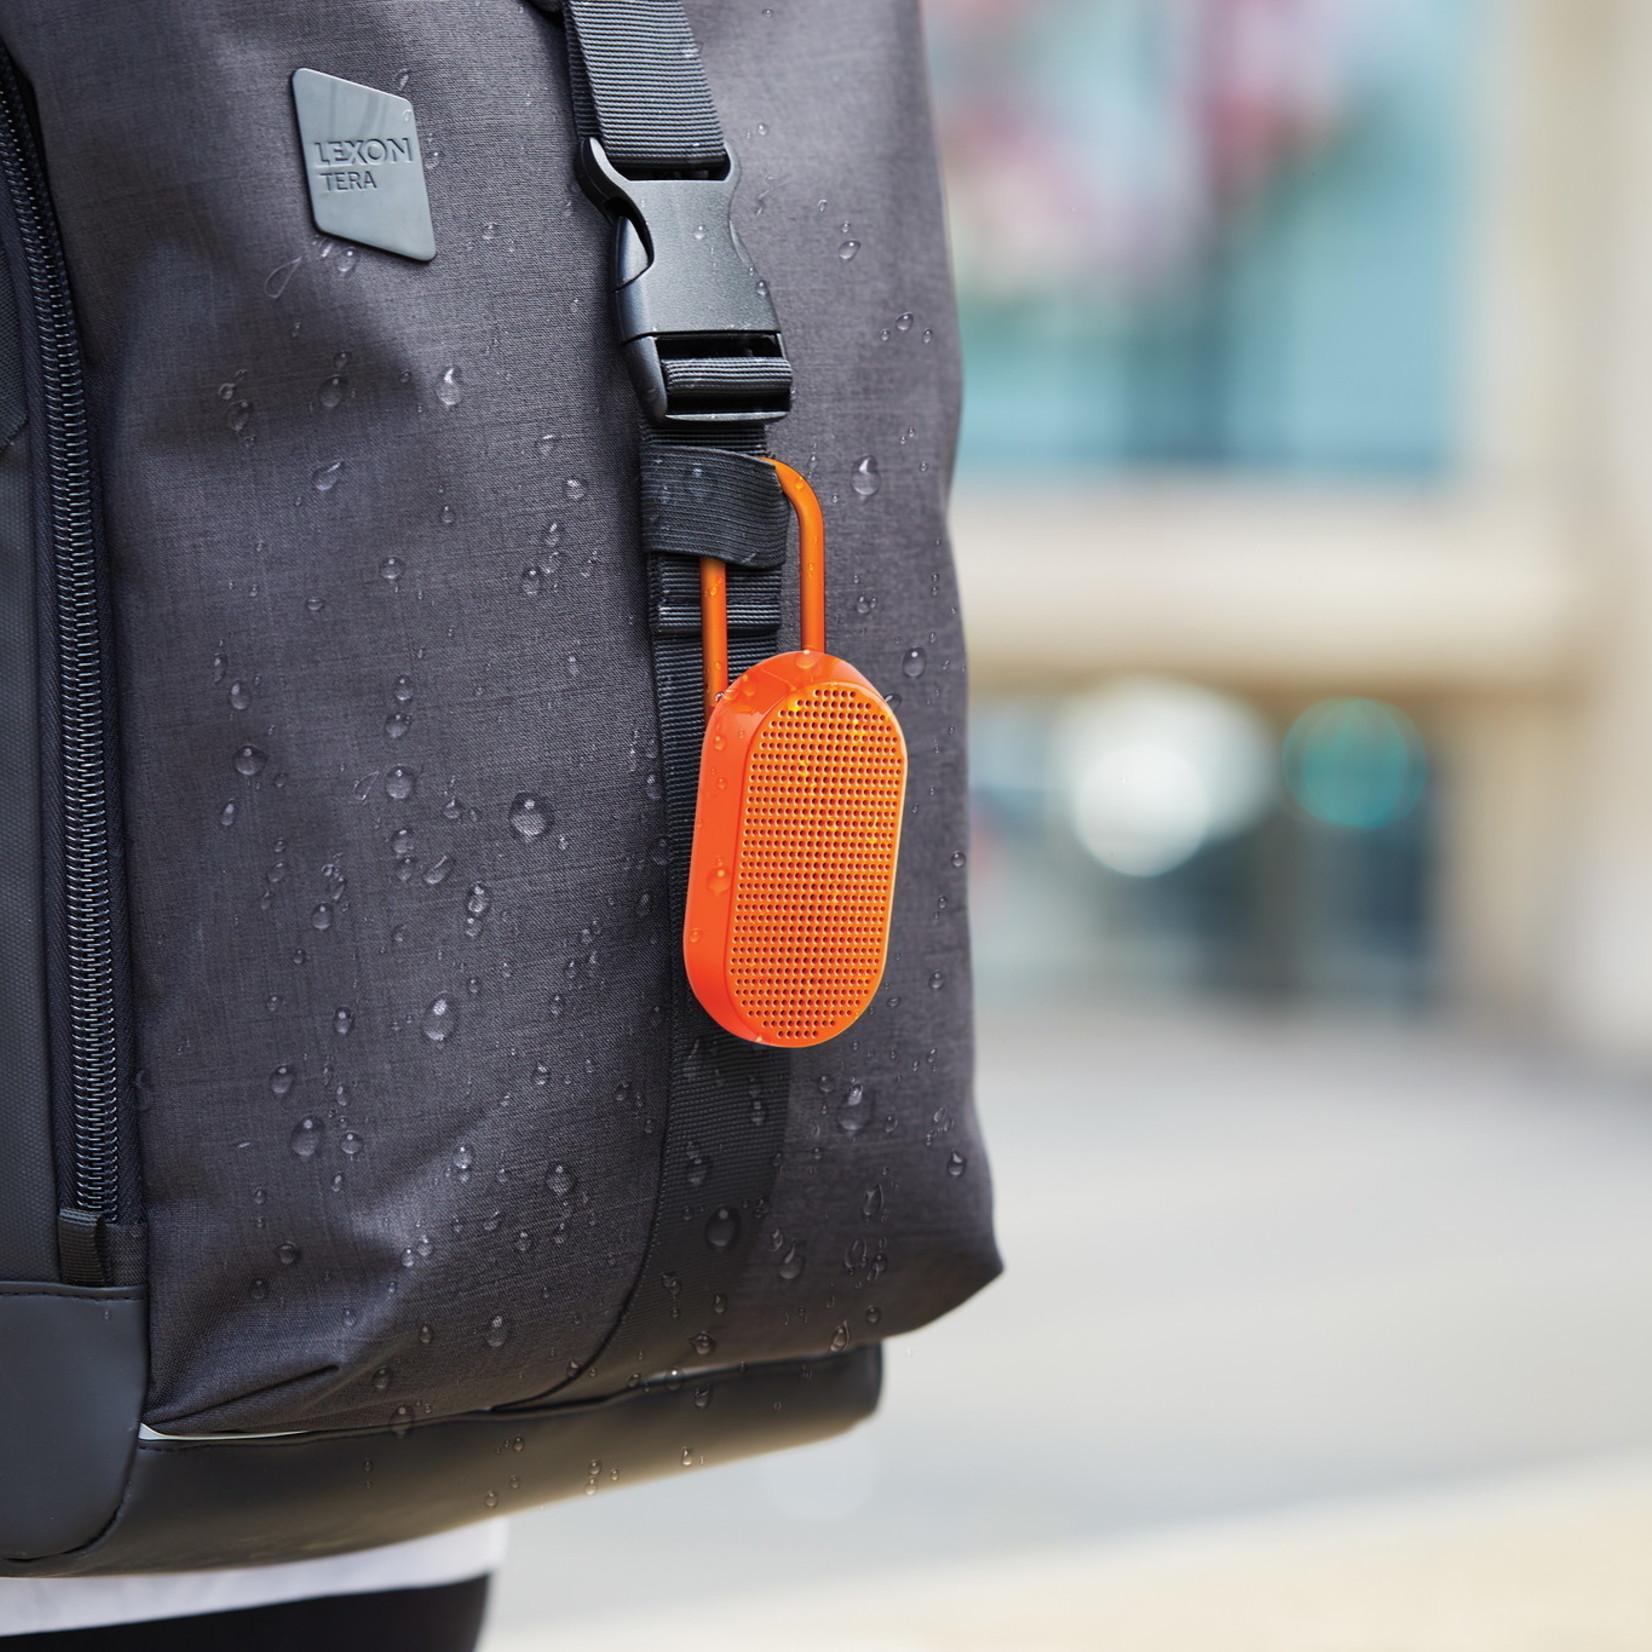 Lexon Lexon Mino T Orange Water Resistant Bluetooth Speaker